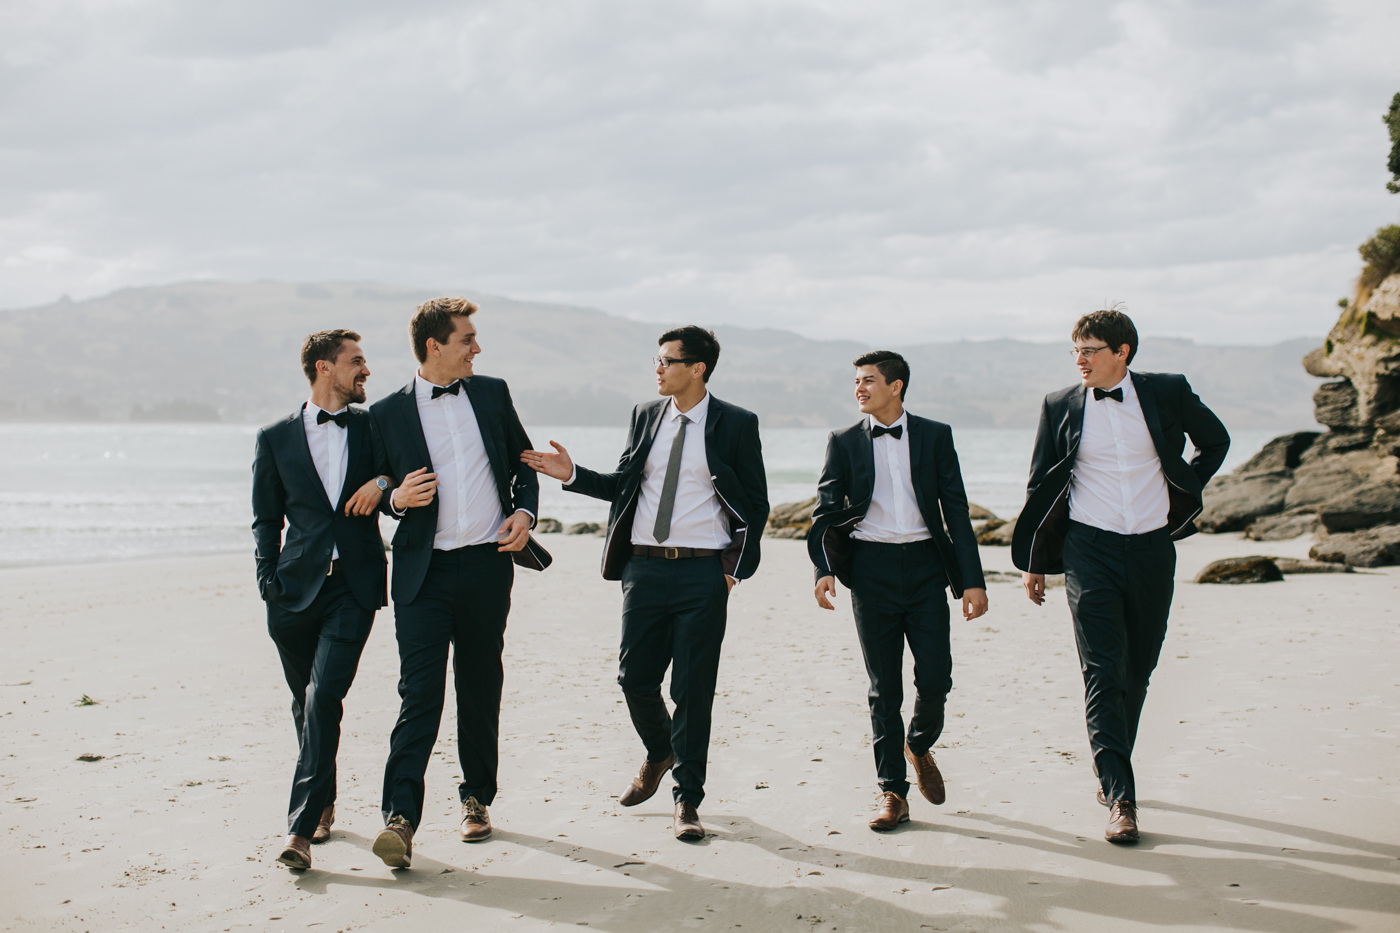 Ariana & Tim - Dunedin, New Zealand Wedding - Destination Wedding - Samantha Heather Photography-145.jpg